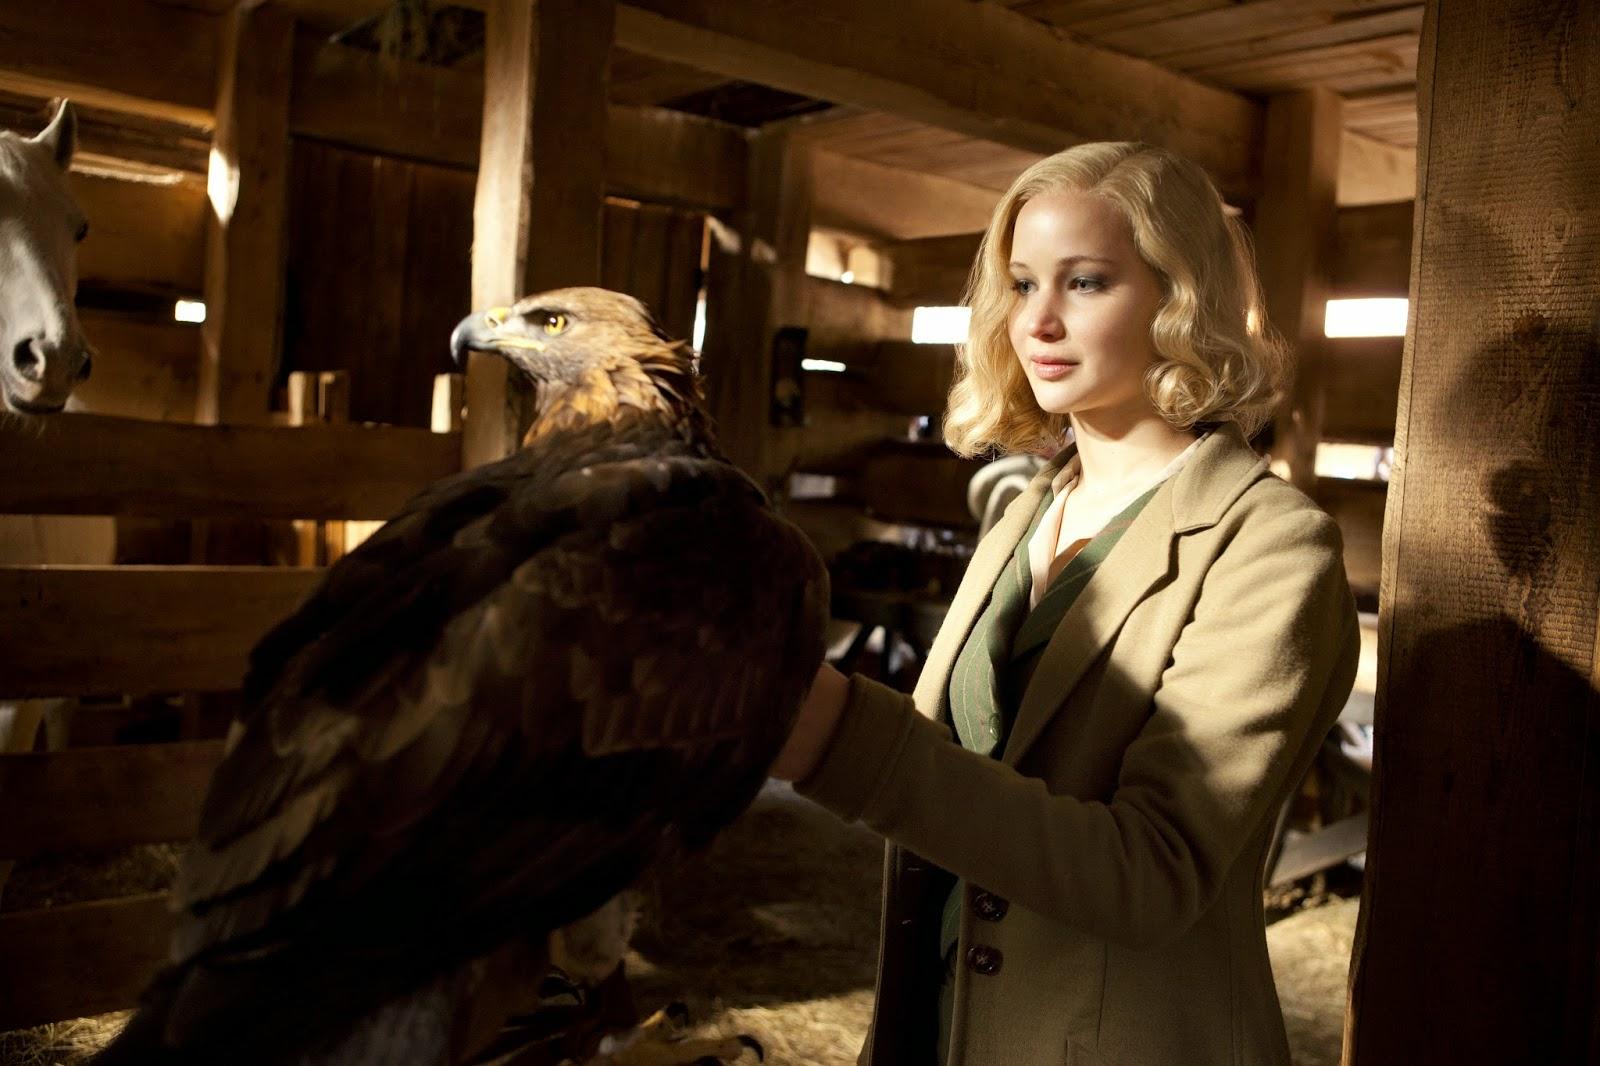 WEIRDLAND: Jennifer Lawrence & Bradley Cooper: Power ...